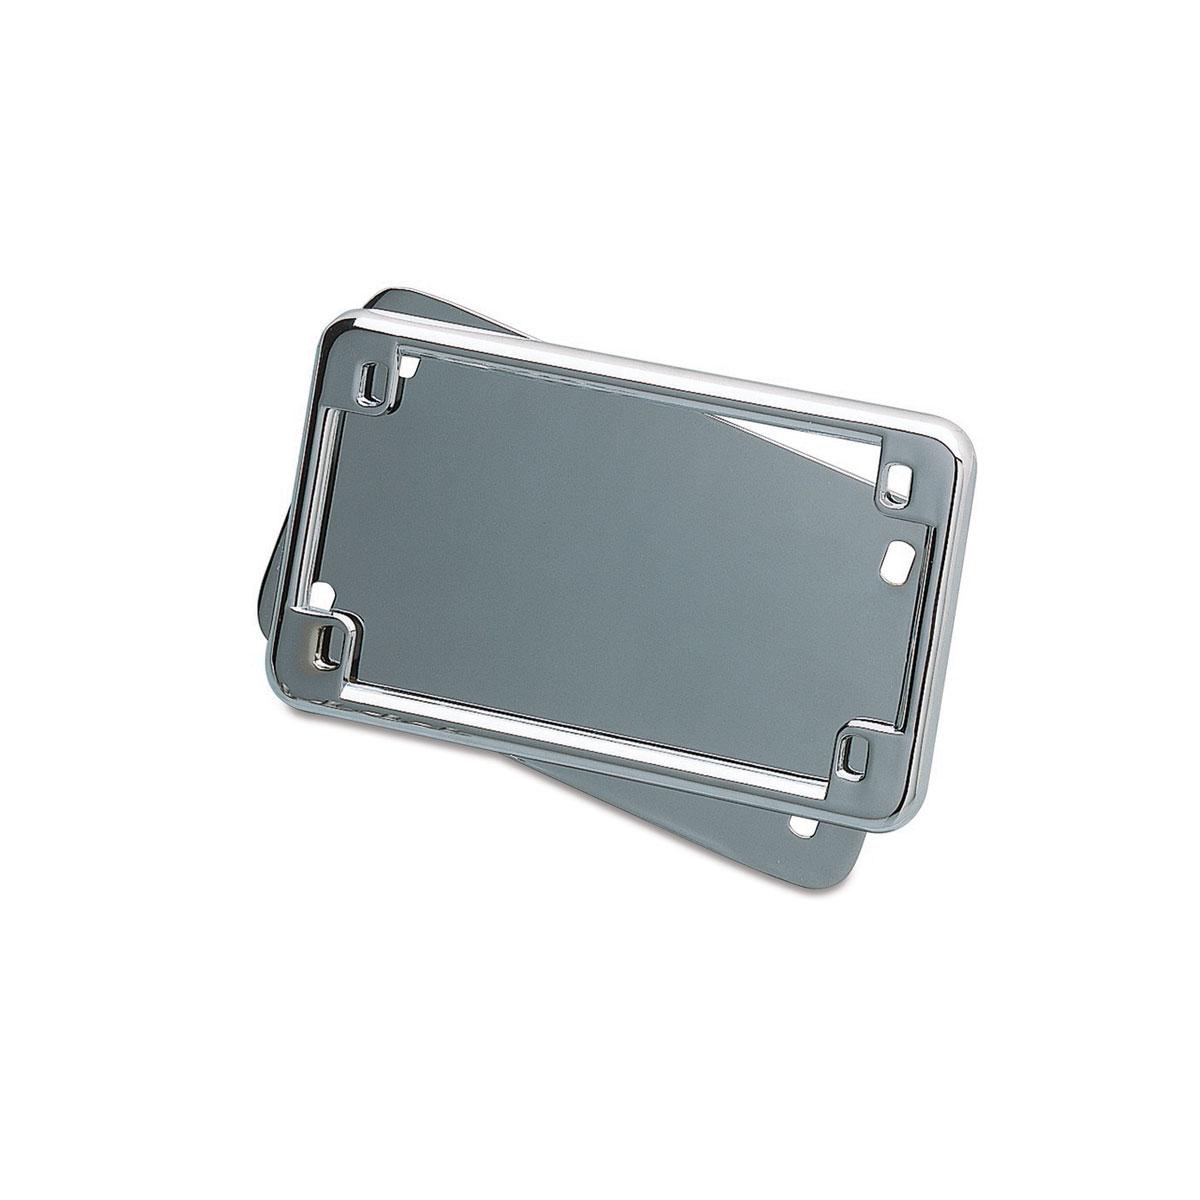 Kuryakyn Chrome License Frame and Back Plate Set